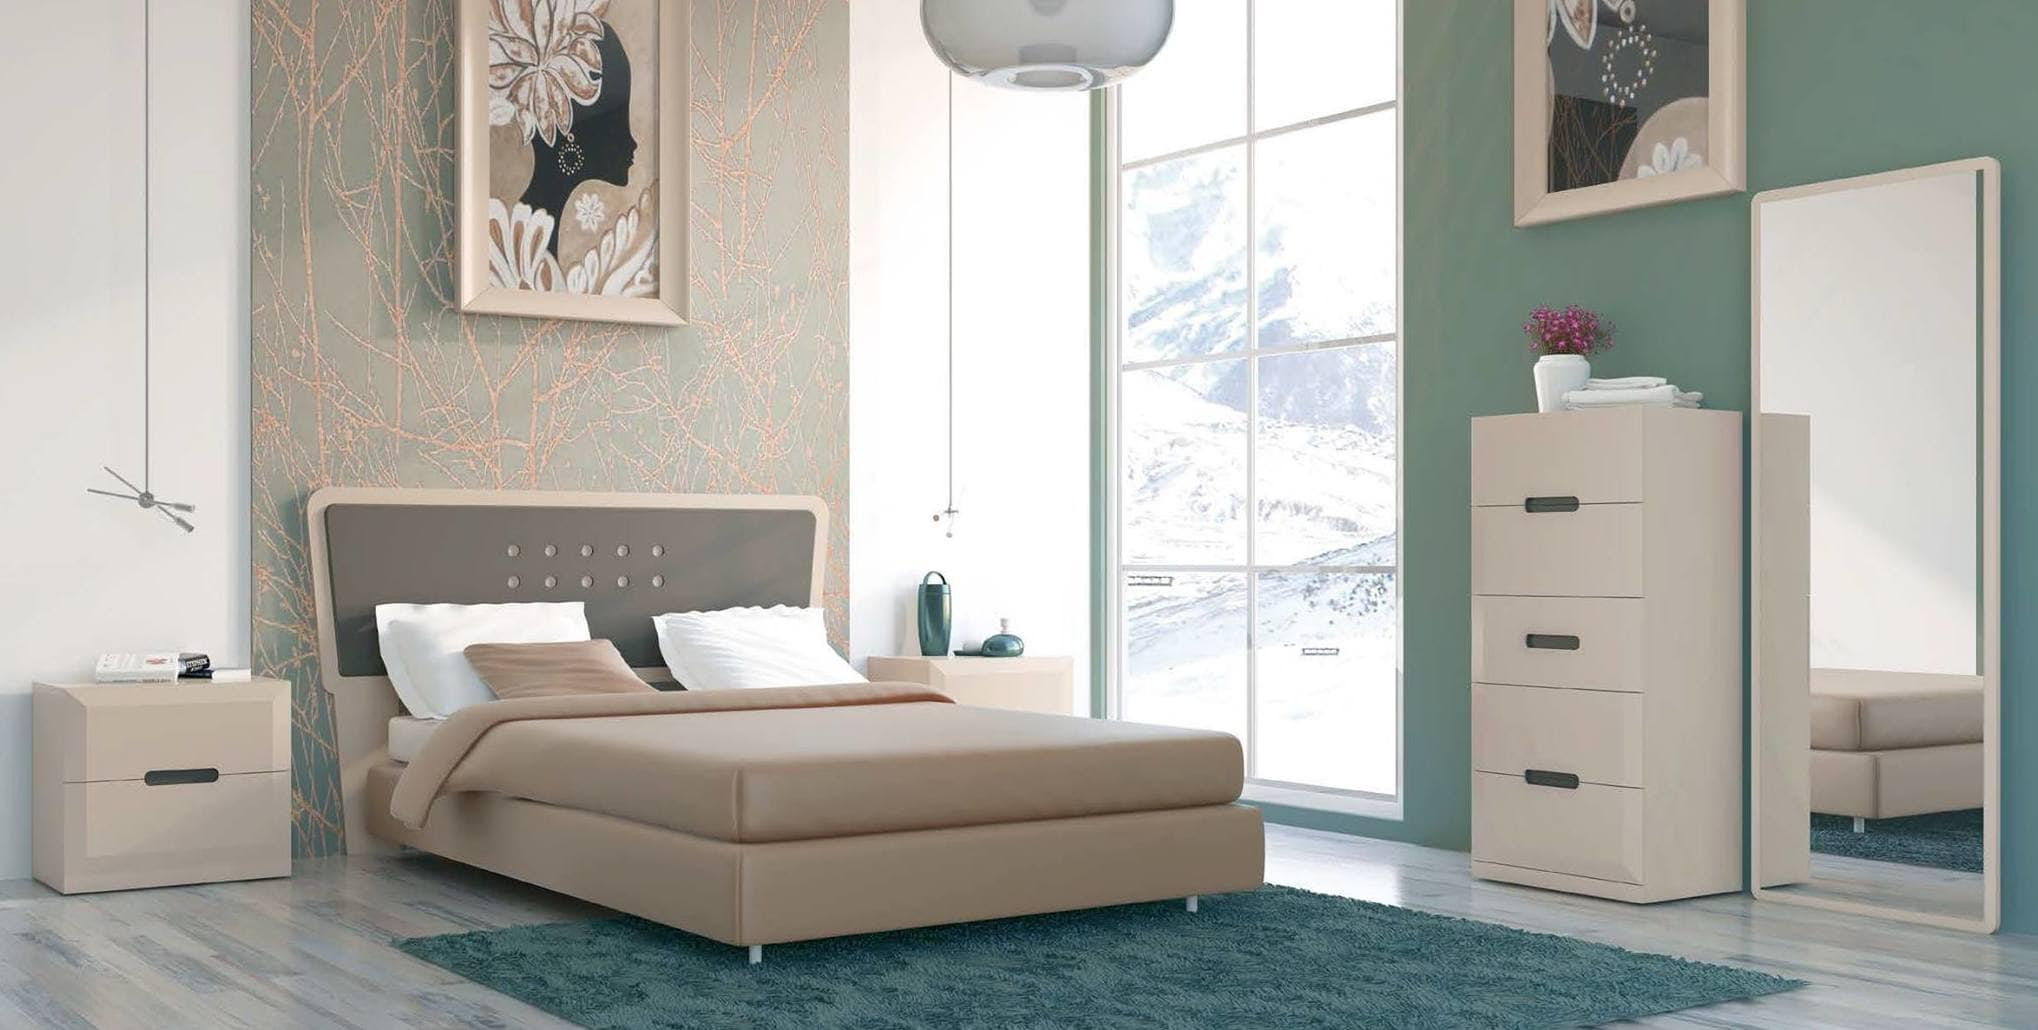 camas de matrimonio baratas con estilo